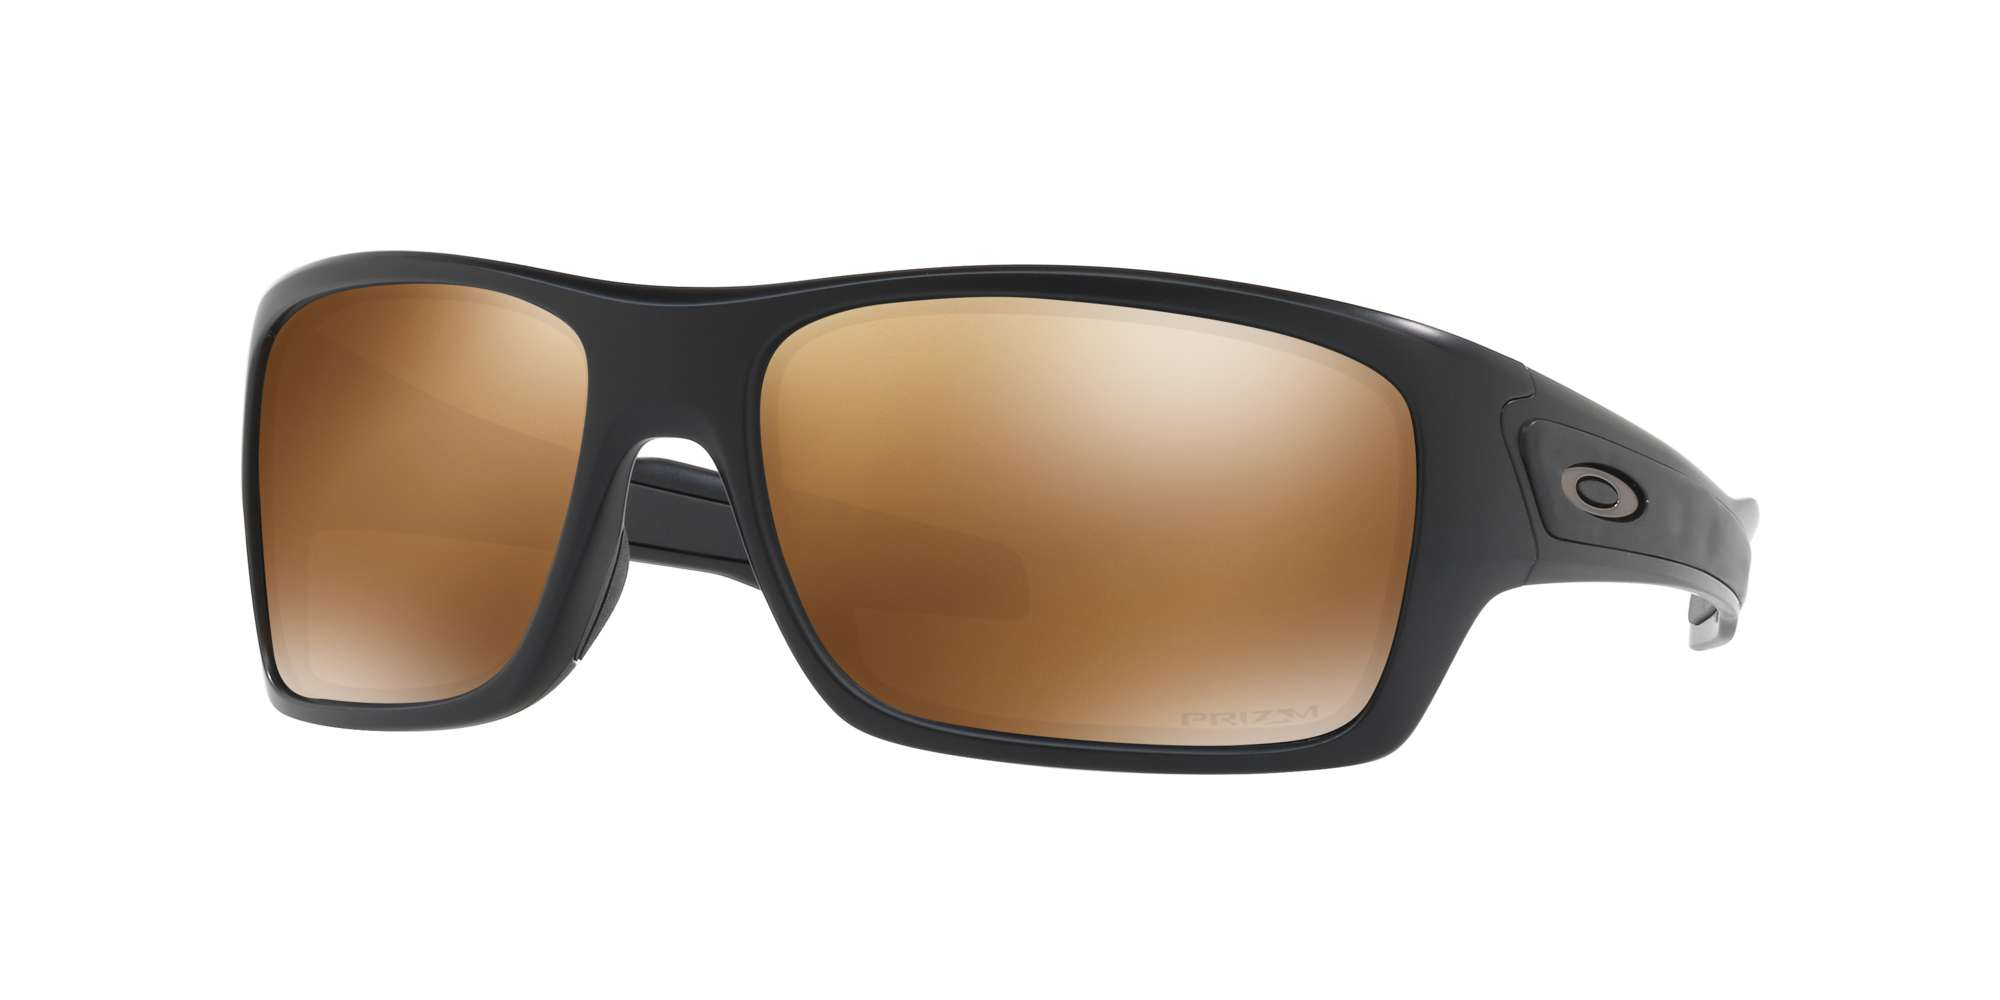 MATTE BLACK / PRIZM TUNGSTEN POLARIZED lenses